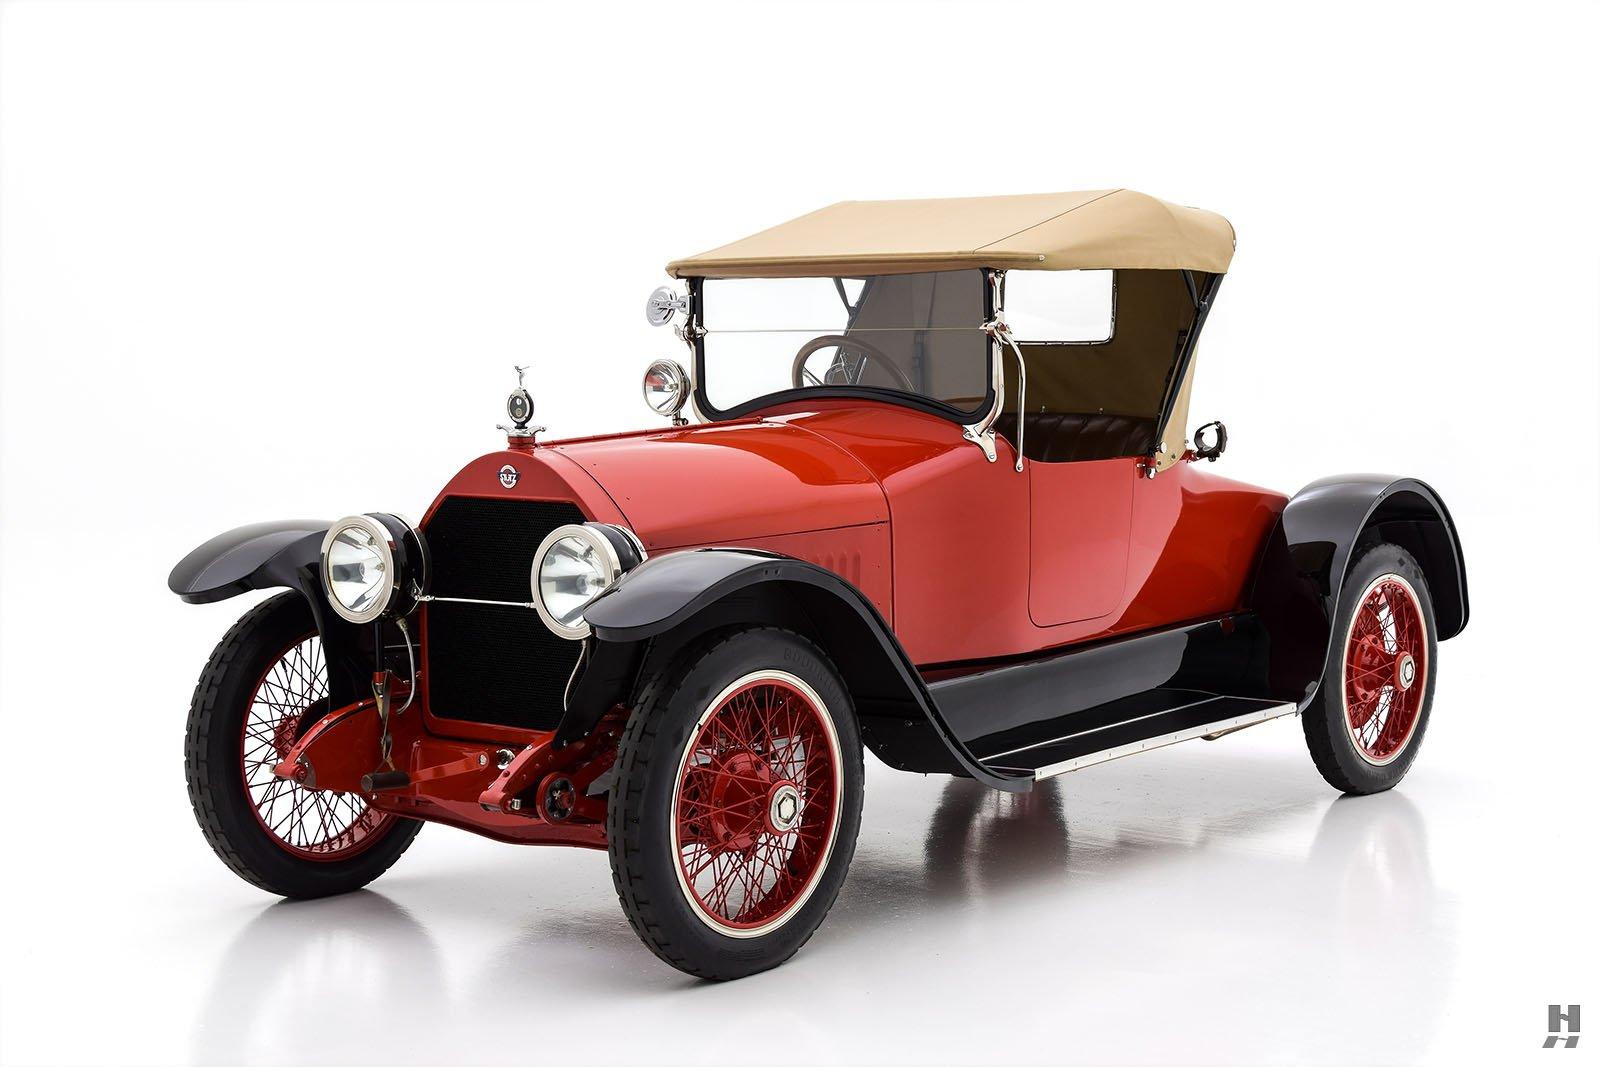 1920 Stutz Series H Roadster For Sale | Classic Cars | Hyman LTD